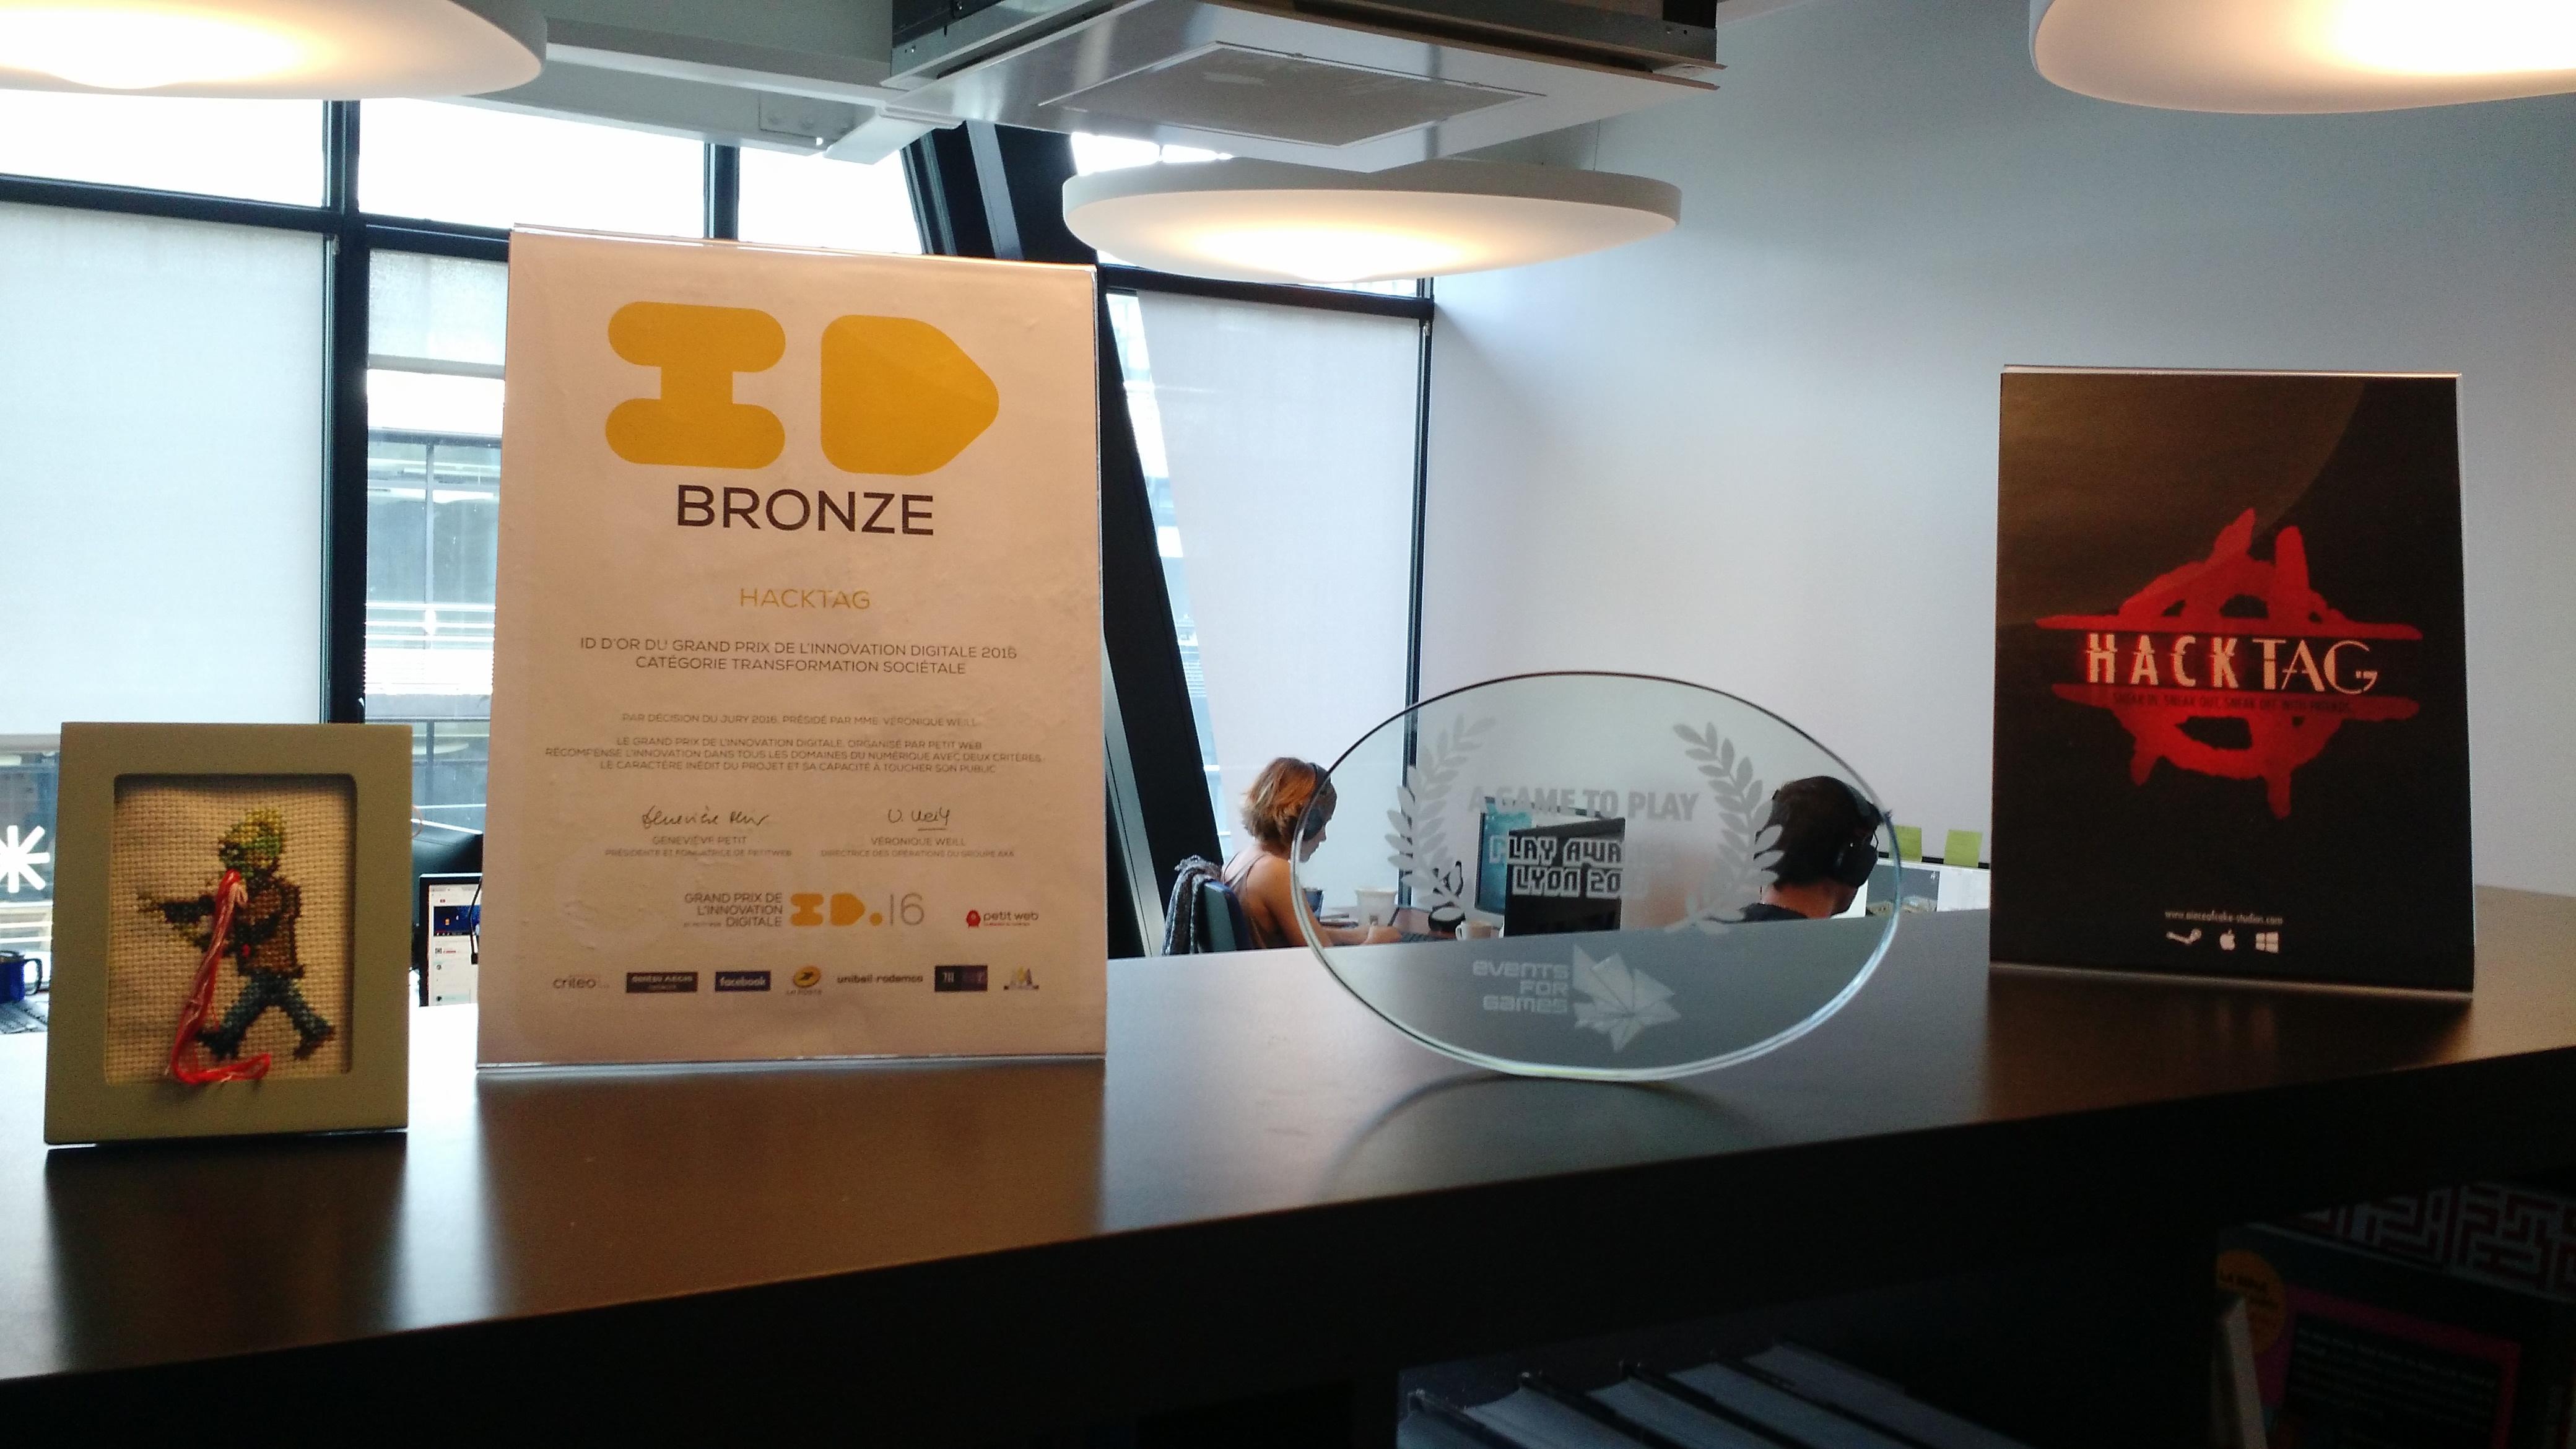 Indie dev Piece of Cake studios won Bronze award at ID16.